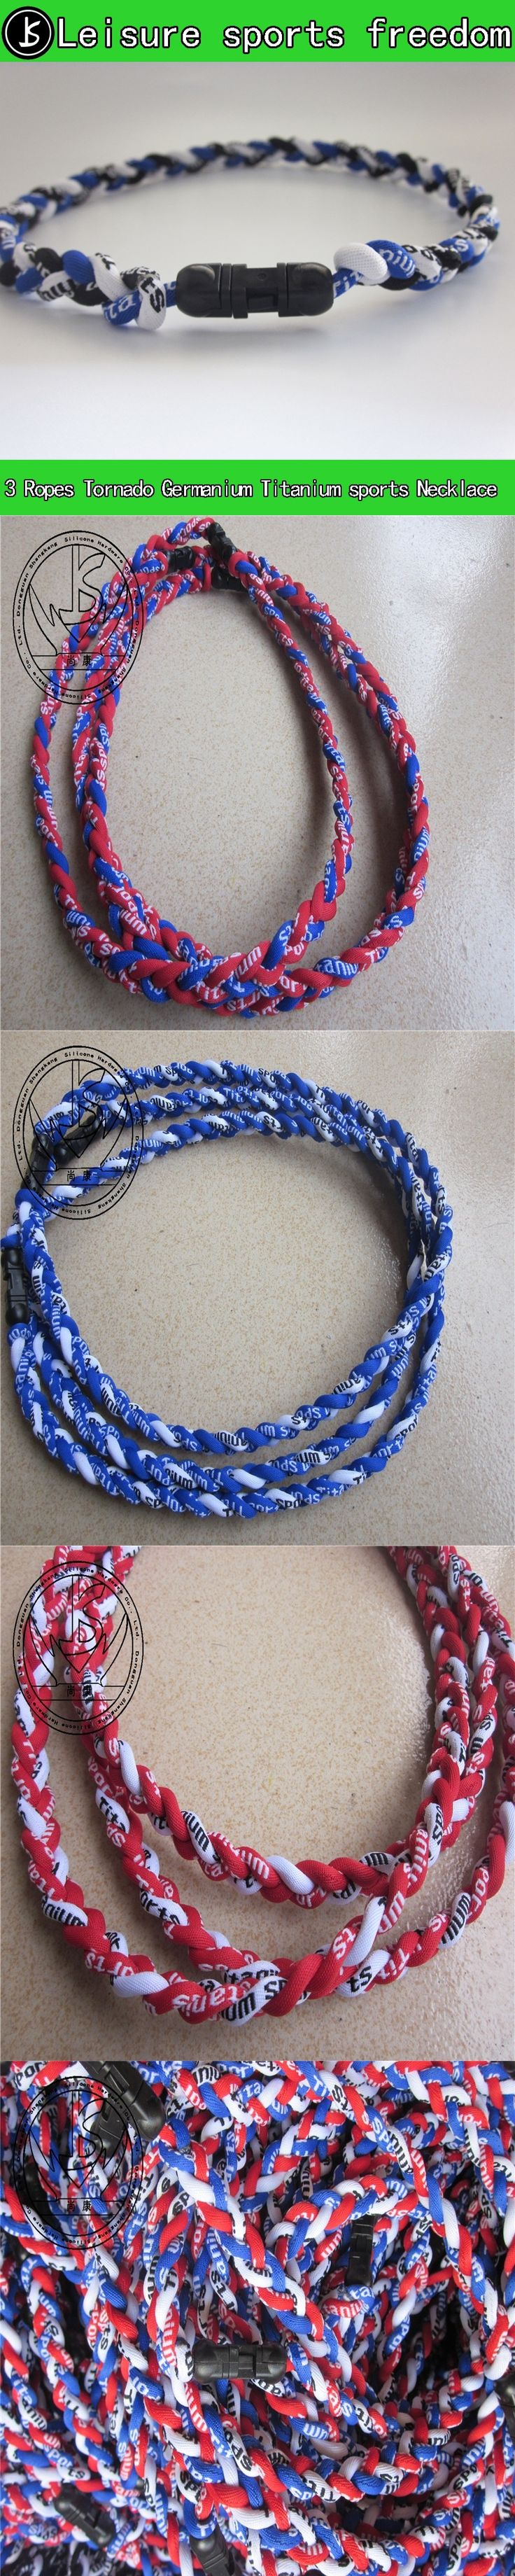 Germanium and titanium braided tornado necklace necklace,MagnetsTitanium Tornado Necklace,3 ropes braided necklace